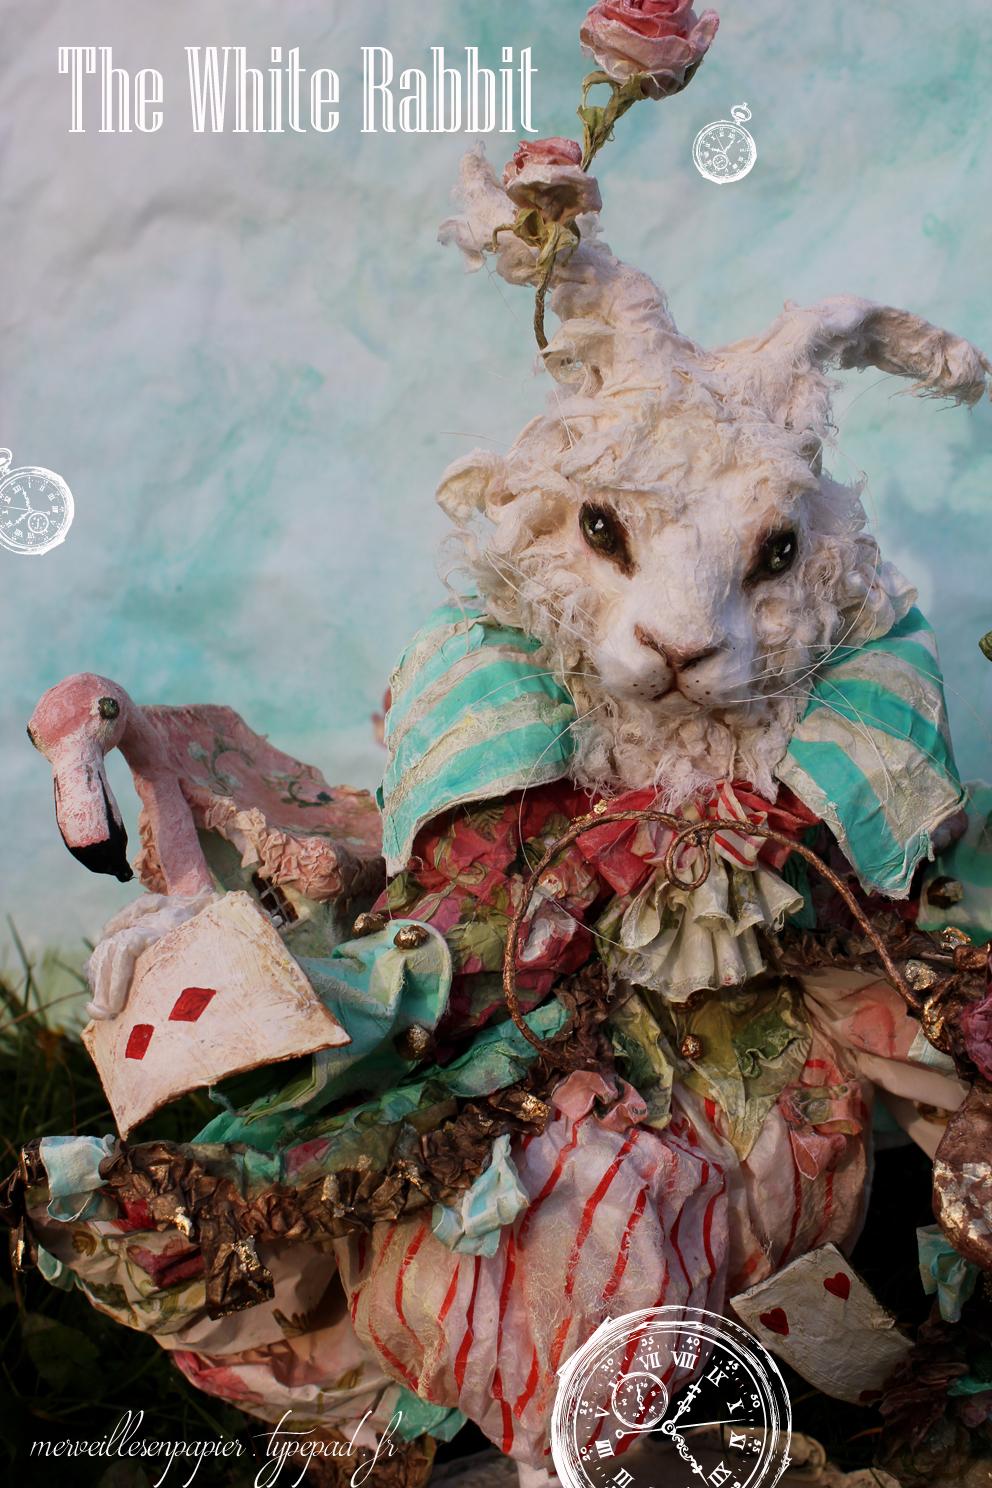 whit-rabbit-alice-in-wonderland.jpg